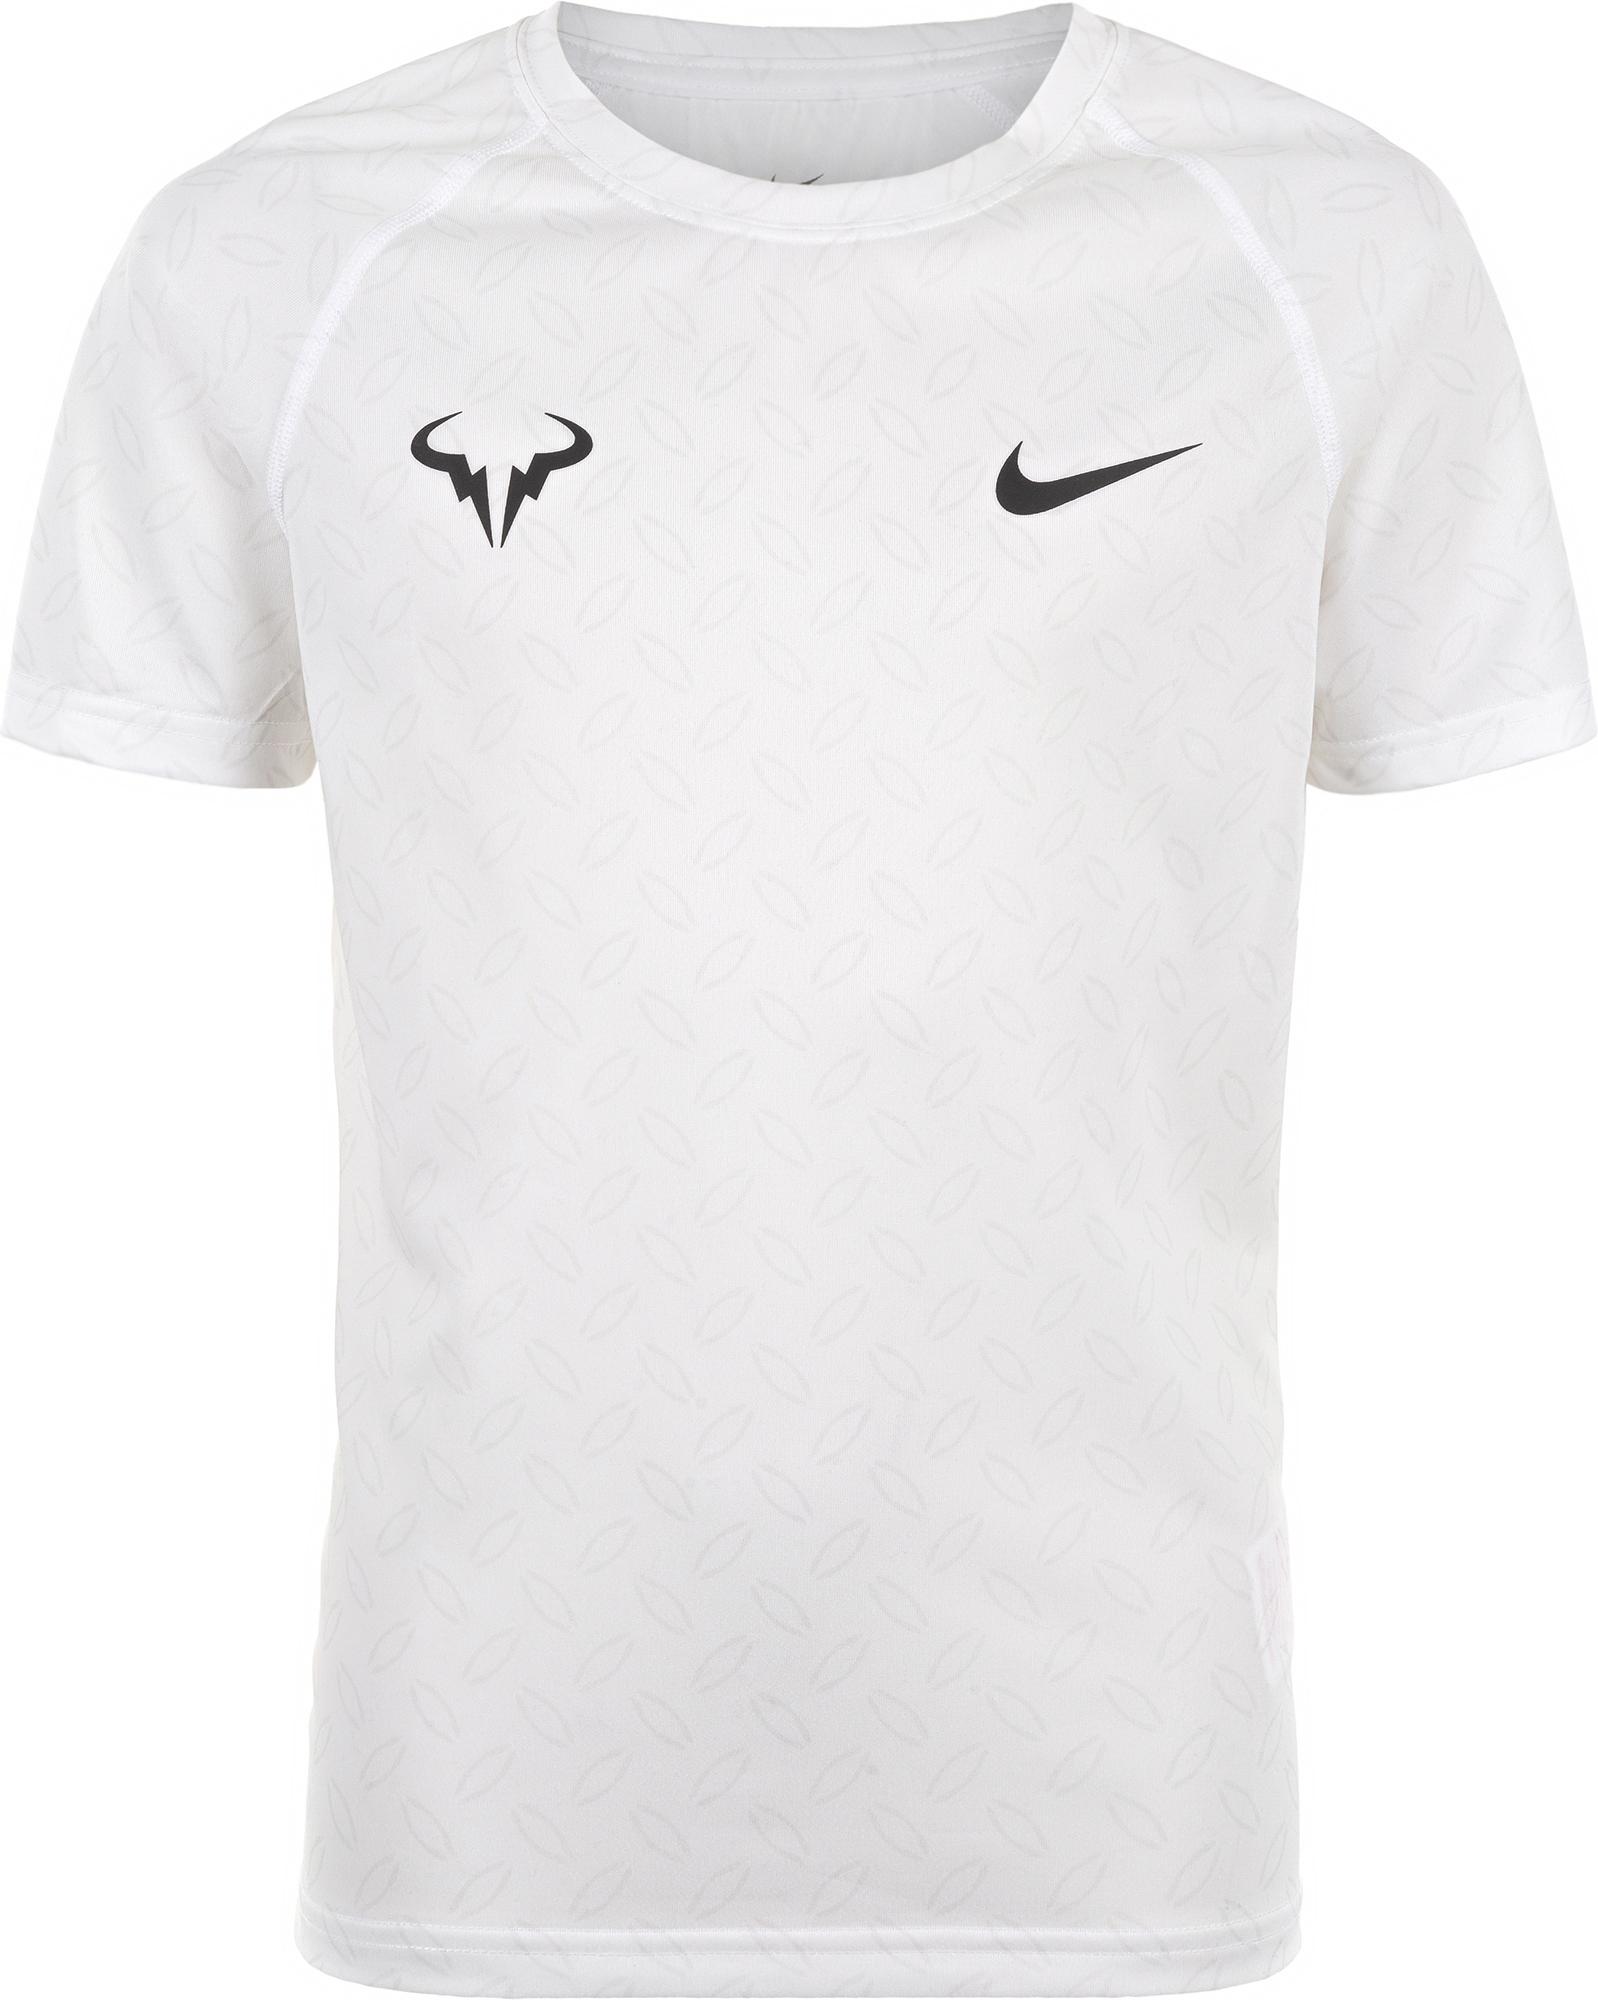 Nike Футболка для мальчиков Nike Dry Rafa, размер 158-170 цены онлайн